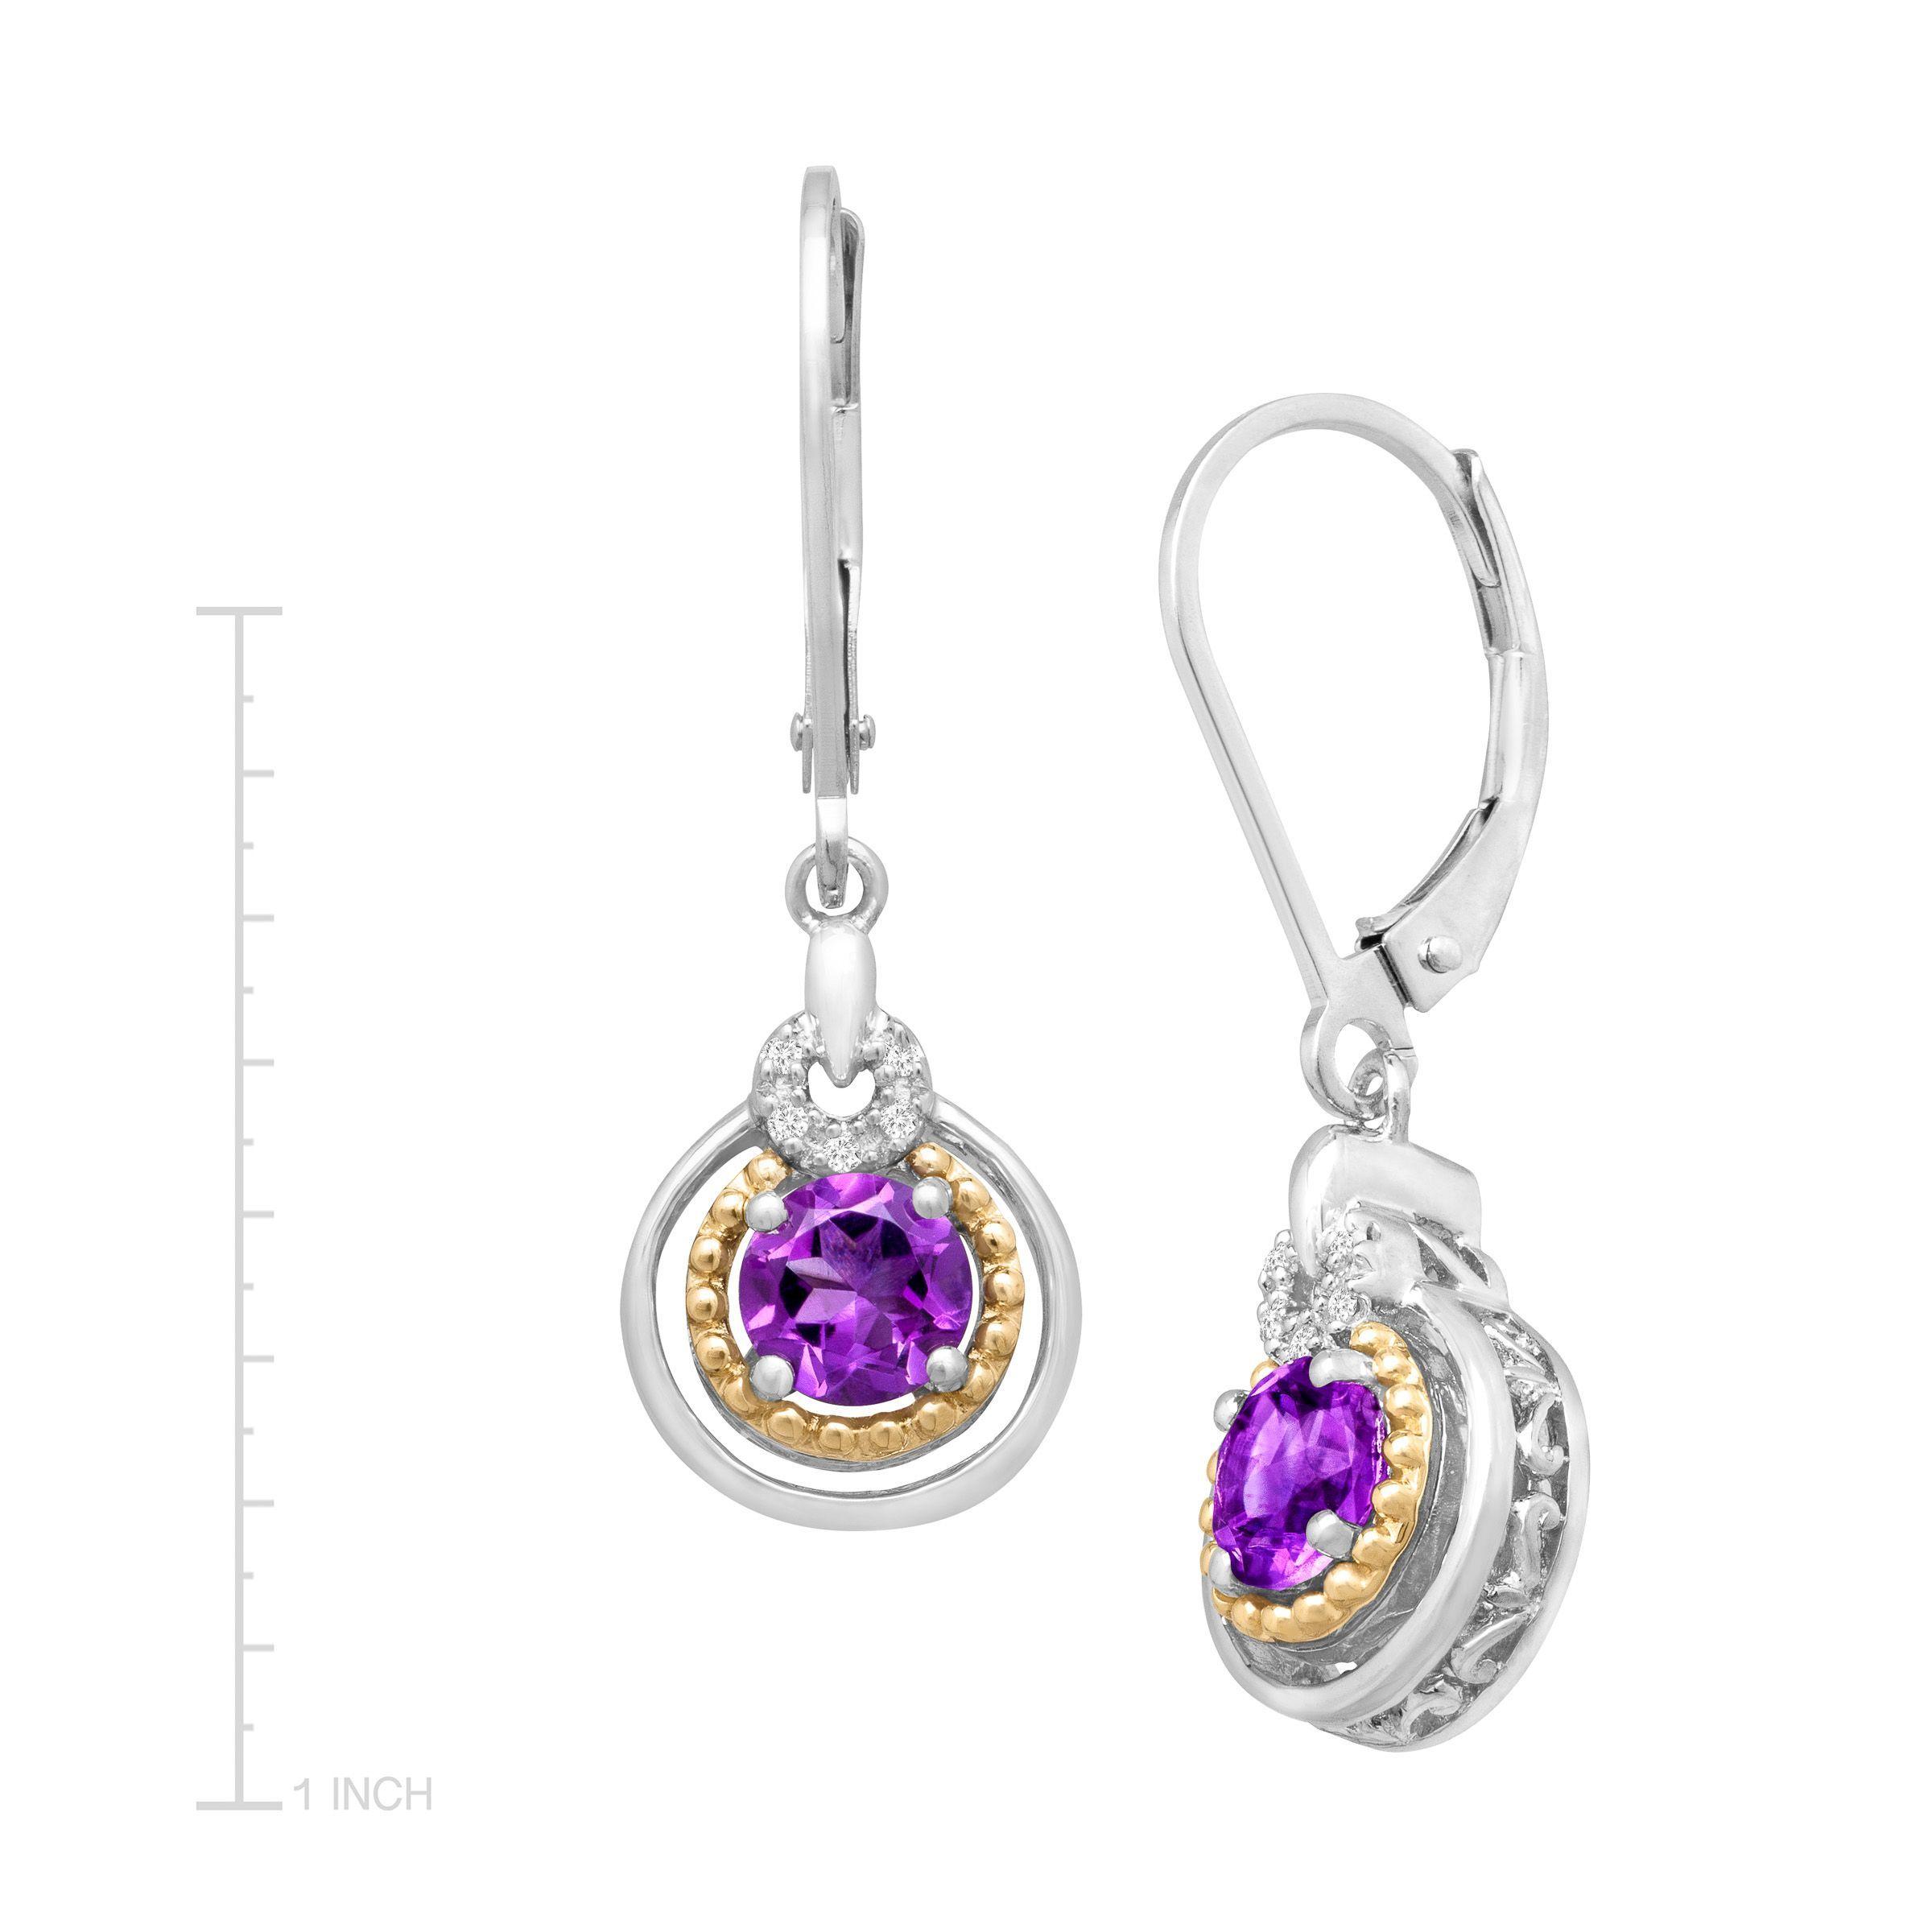 7 8 Ct Natural Amethyst Drop Earrings W Diamonds In Sterling Silver 14k Gold